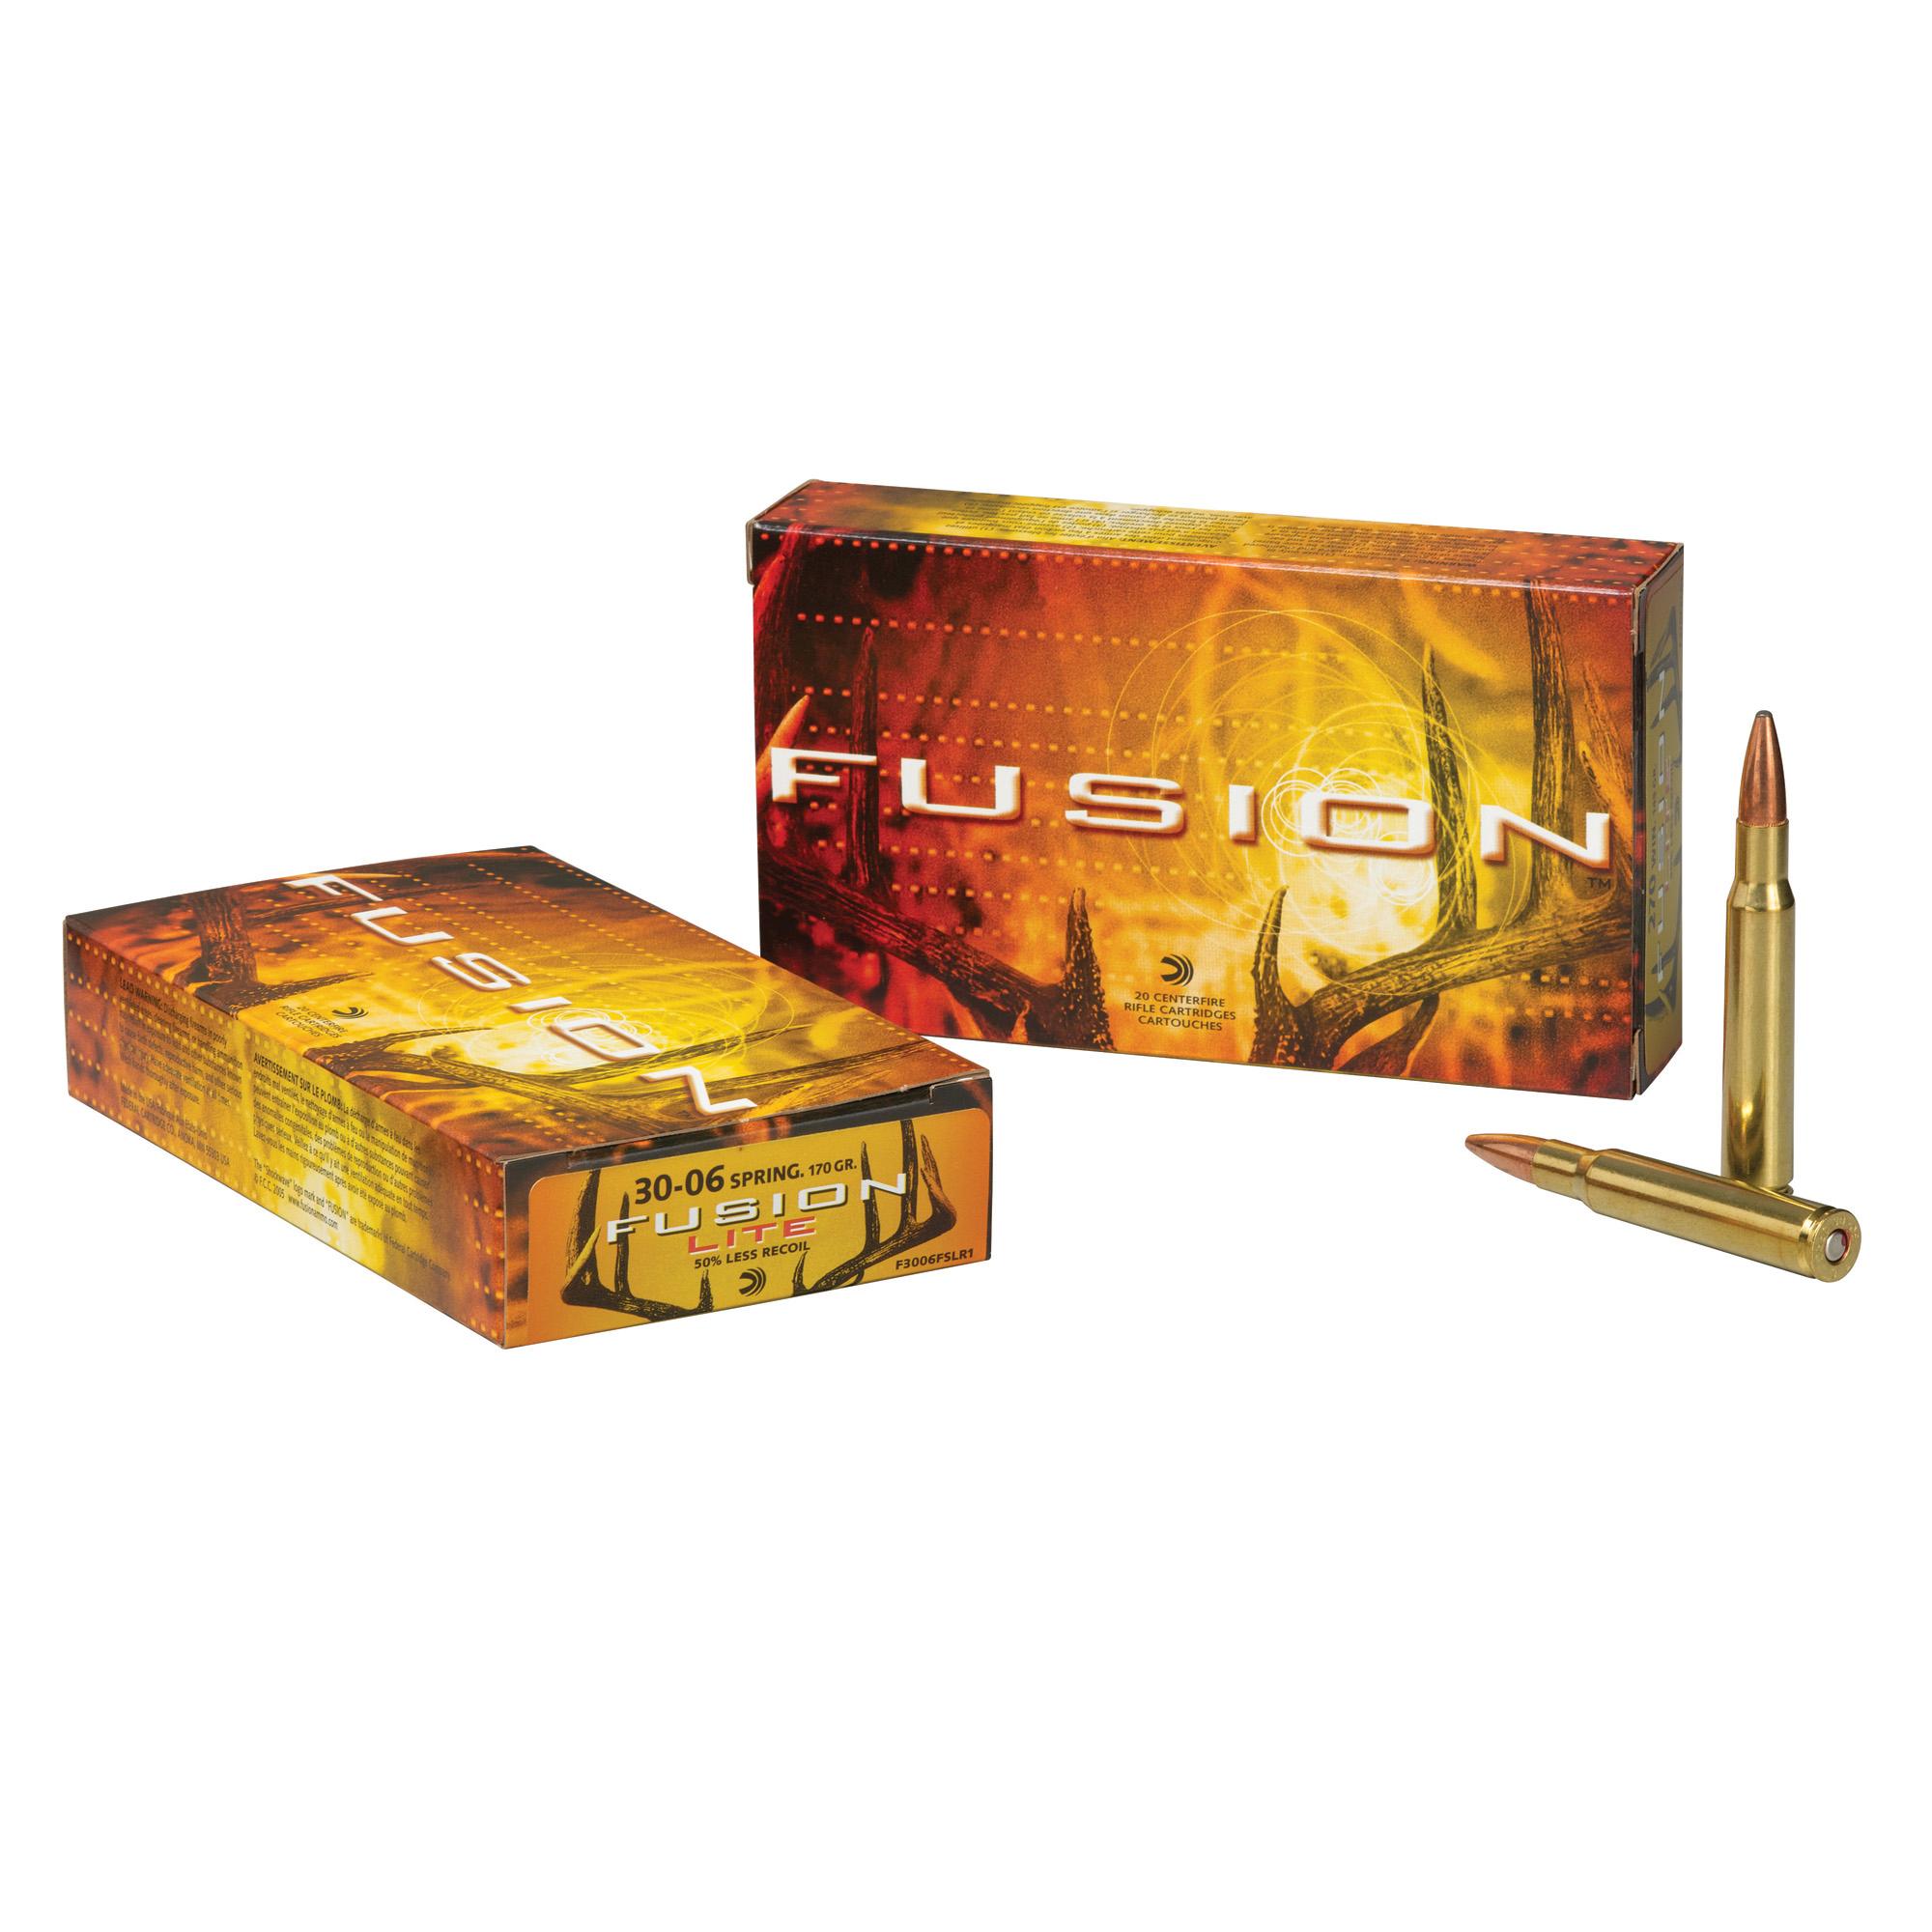 Fusion Rifle Ammunition, 7mm Rem Mag, 175-gr, BTSP